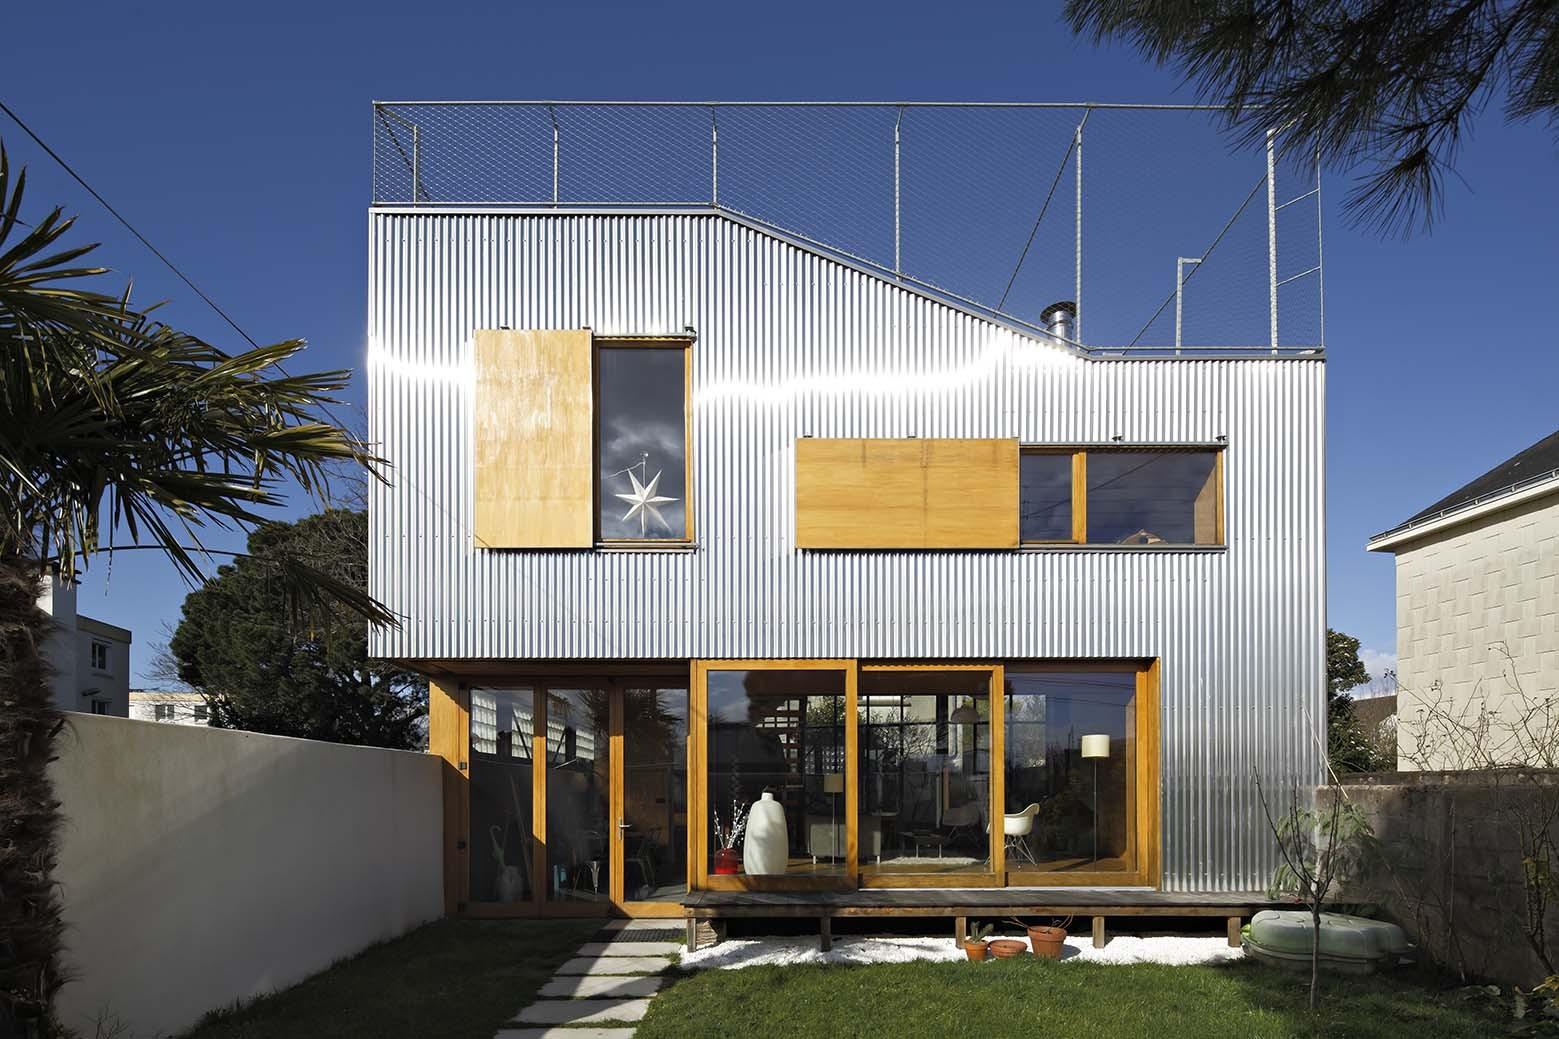 Nantes tag archdaily landscape house mabire reich solutioingenieria Choice Image